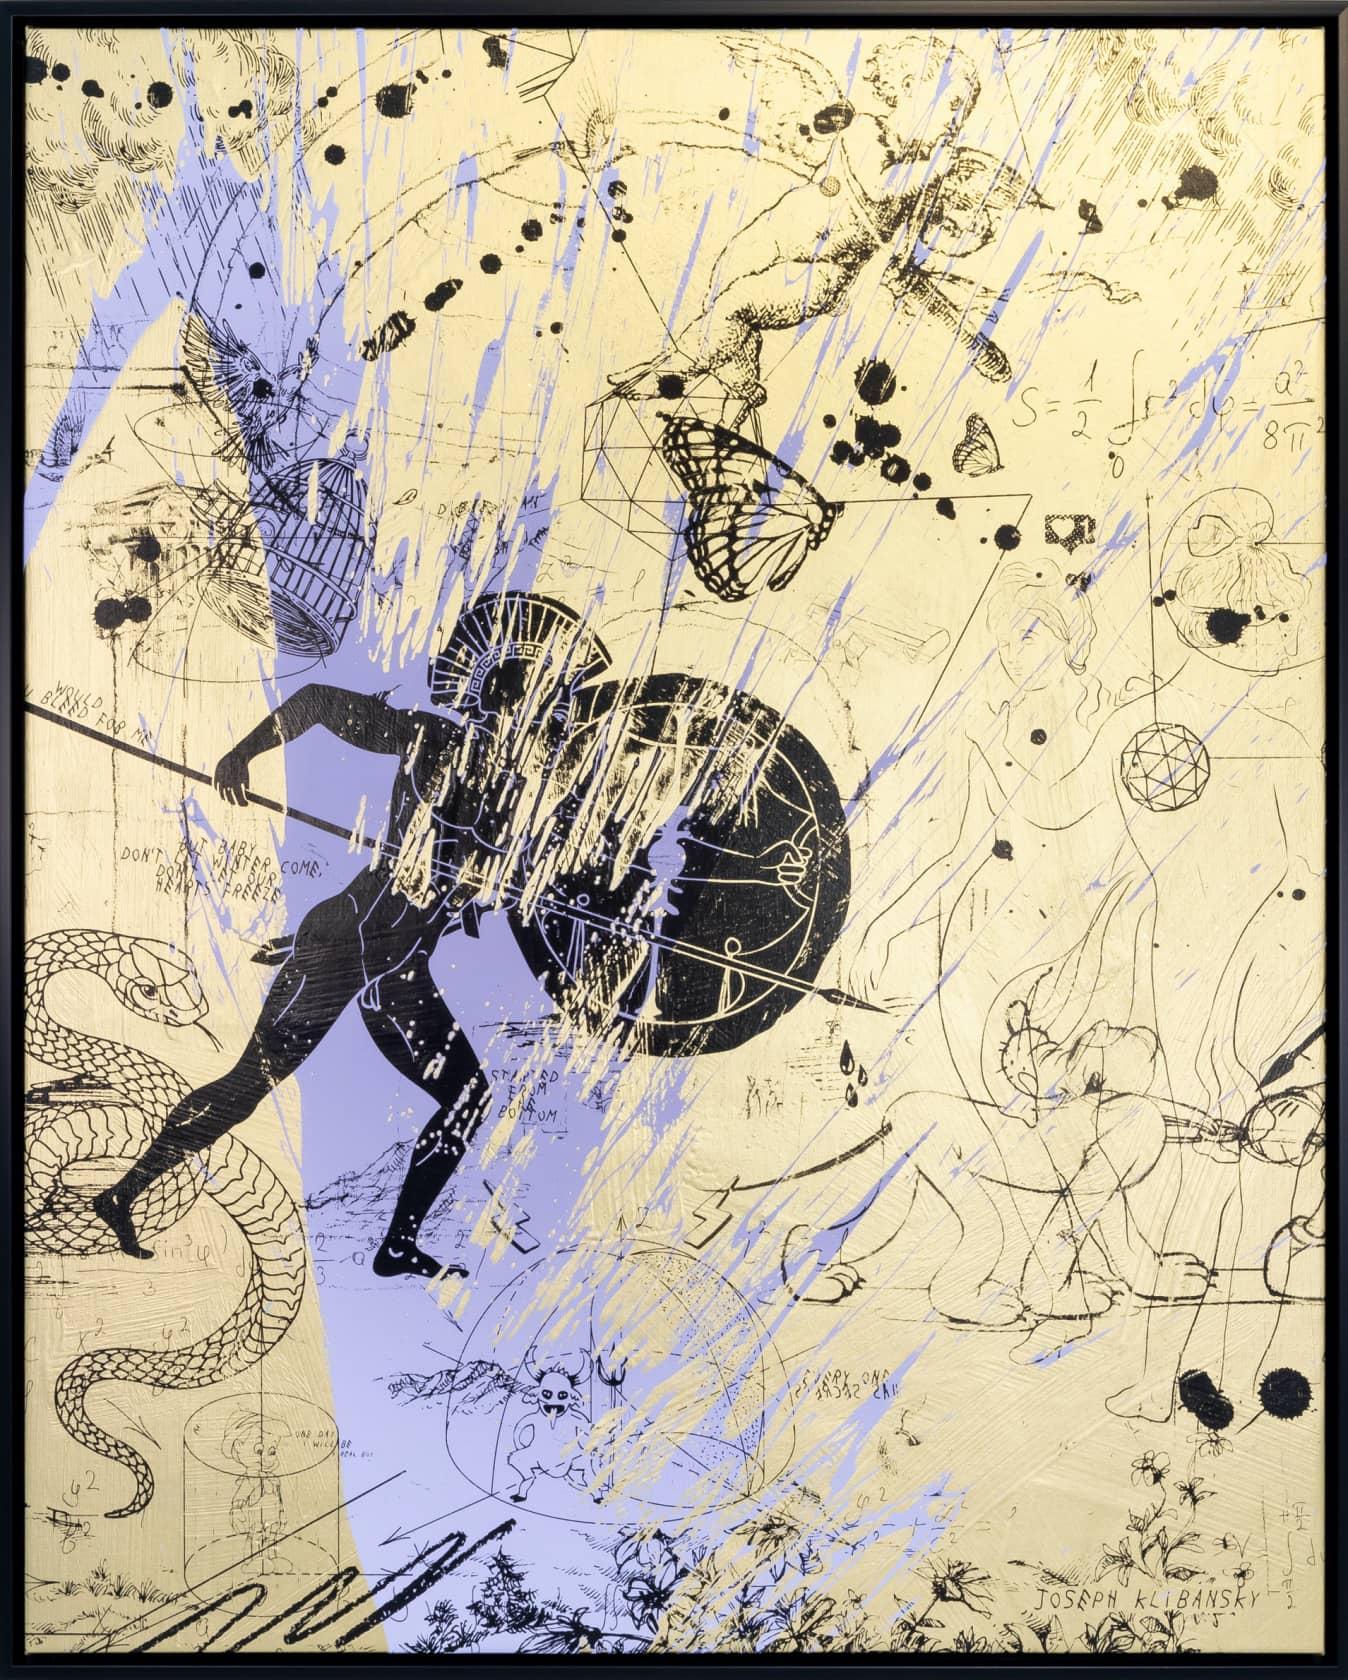 Joseph Klibansky Forever Mine (Gold/Black, Lilac Splash) Silkscreen and Acrylic on Canvas